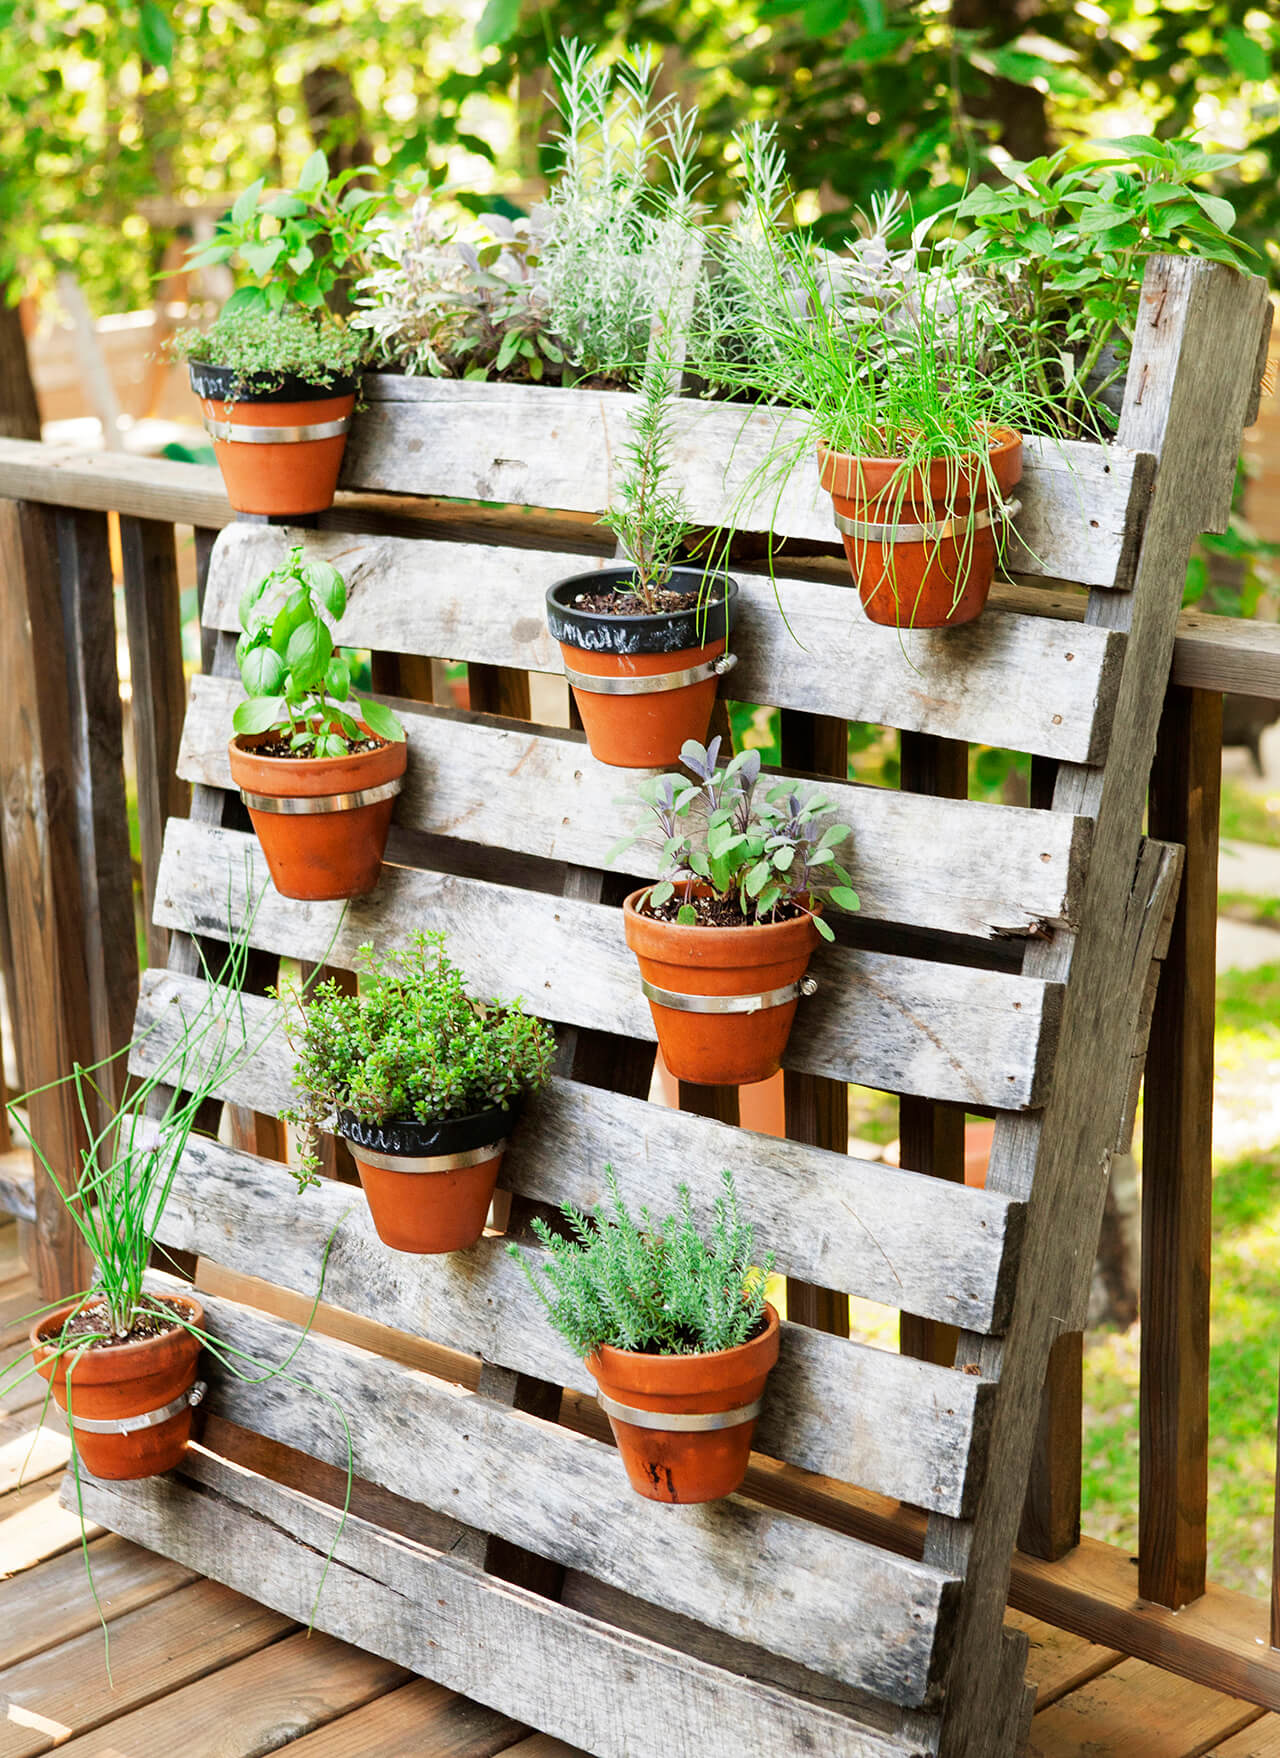 creative garden ideas 18. palette and pot planter for small spaces DKXEYVU